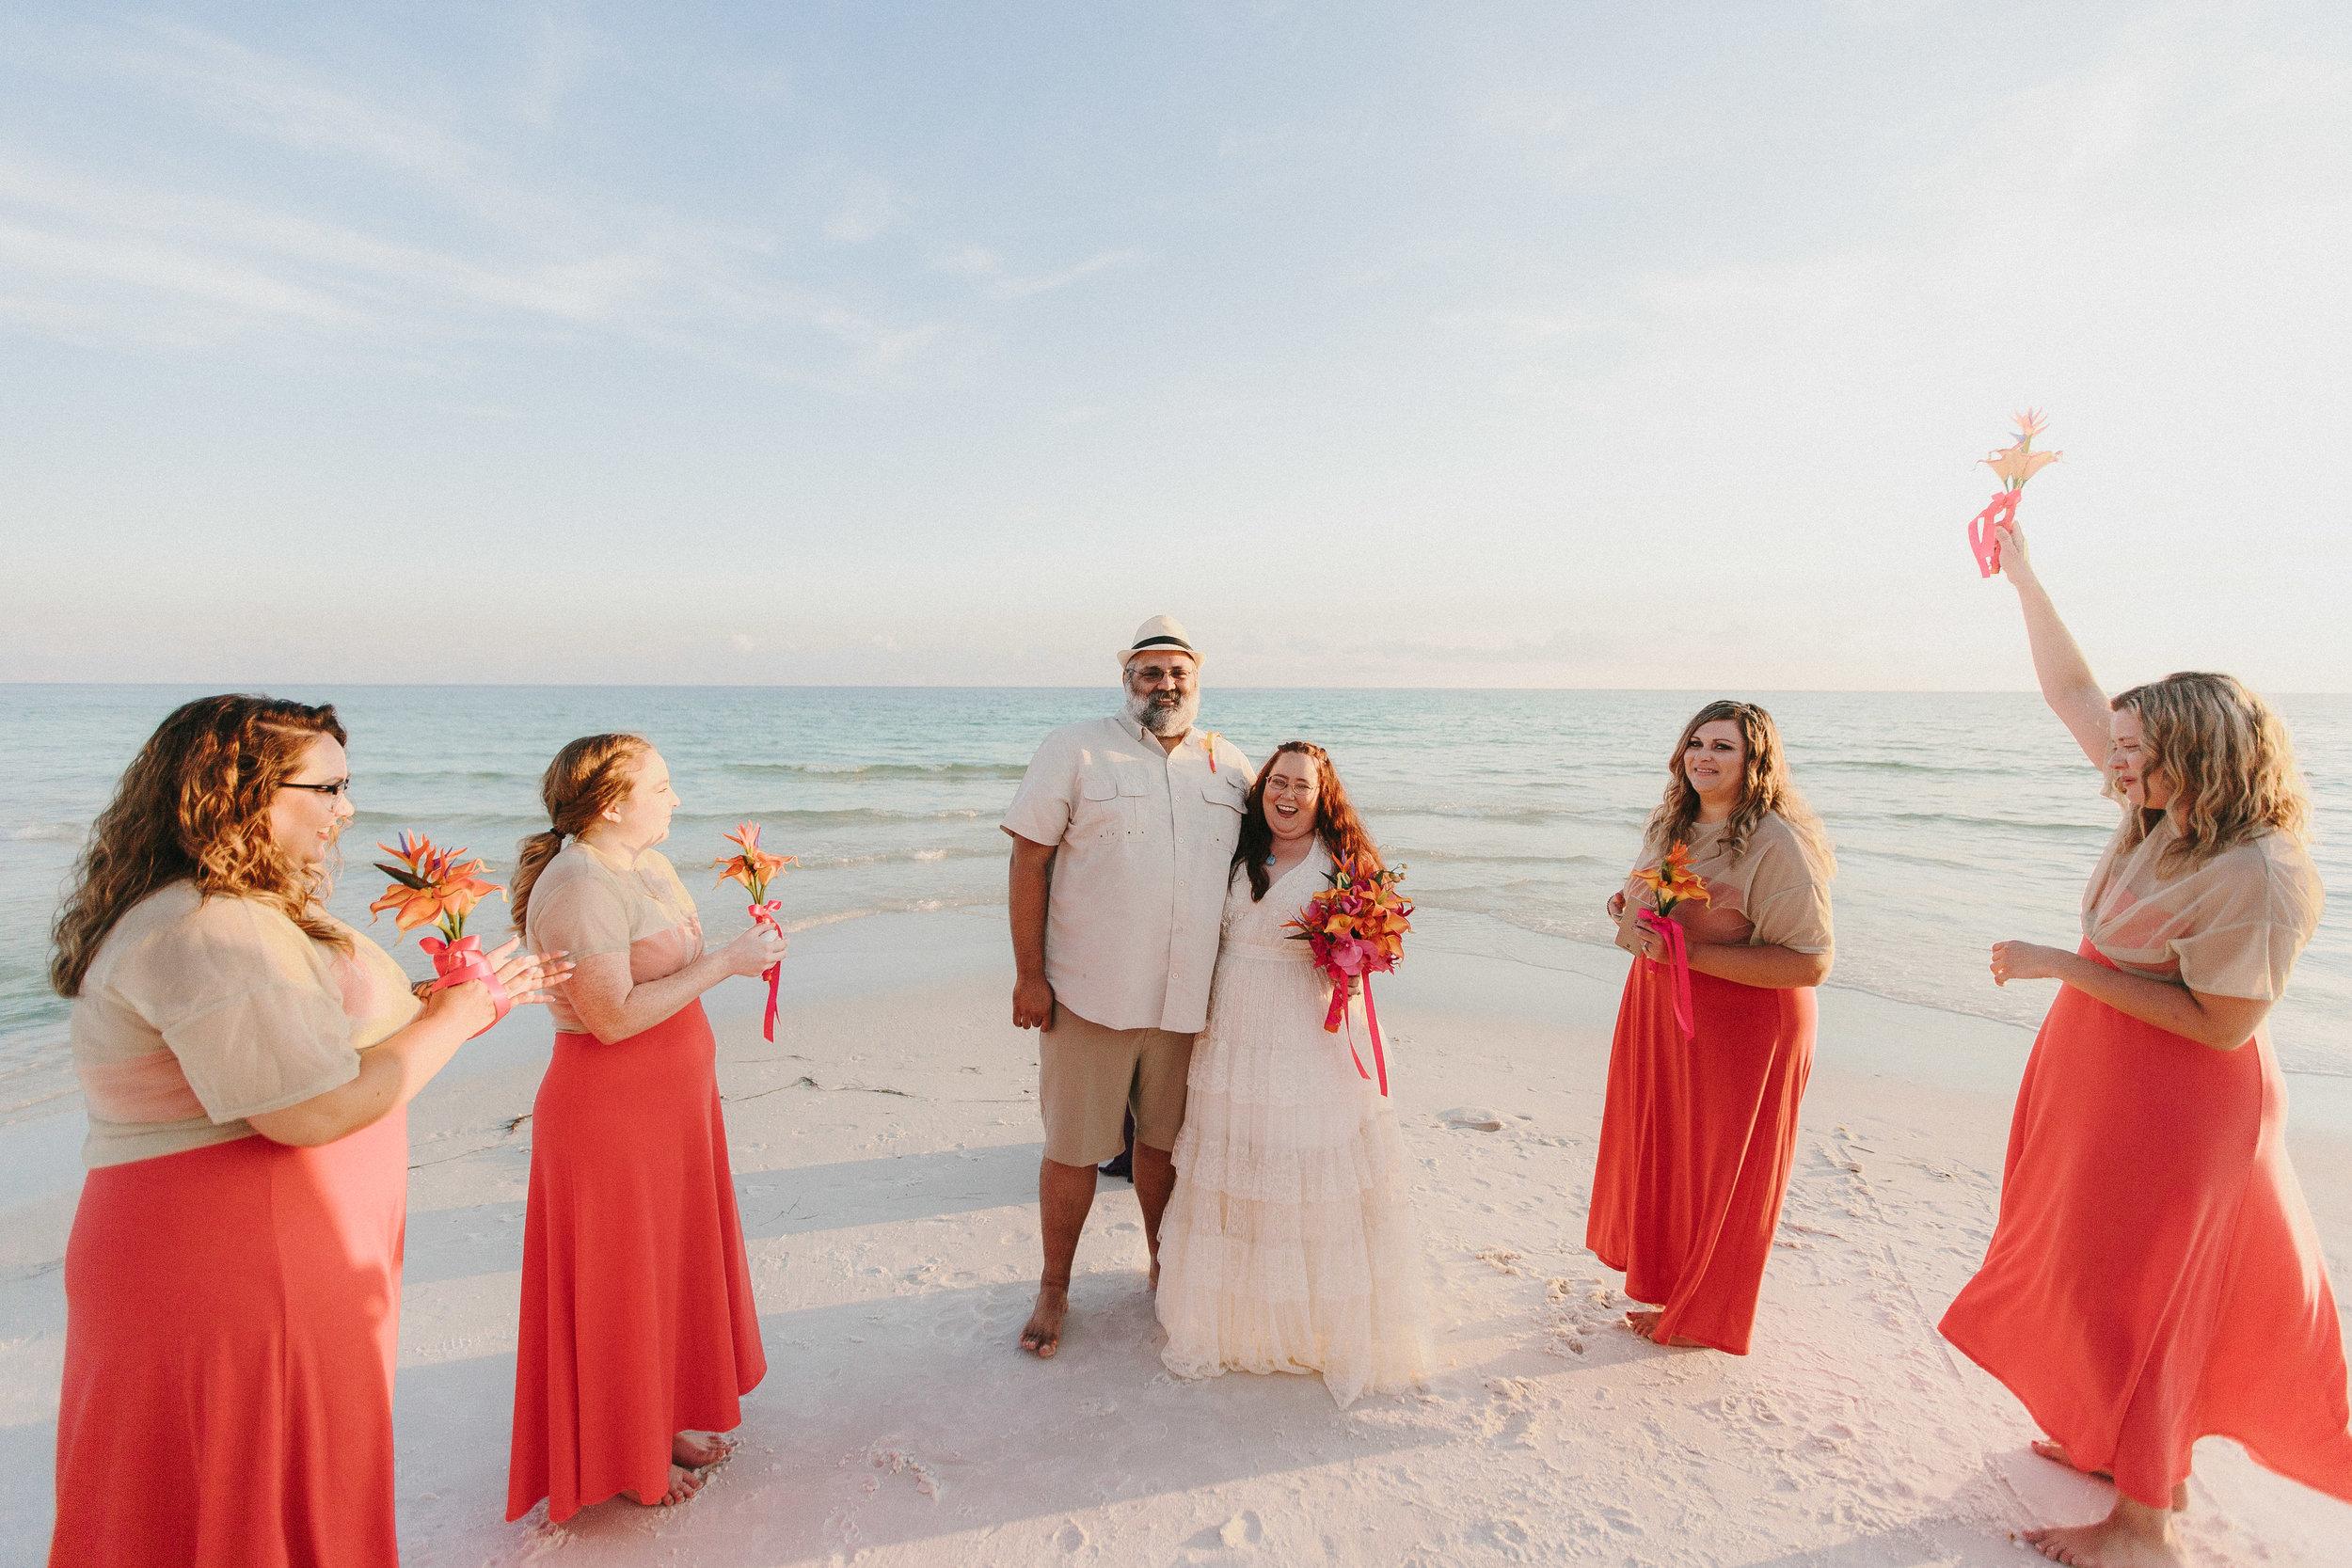 destin_sunset_beach_elopement_intimate_wedding_photographer_florida_documentary_1223.jpg